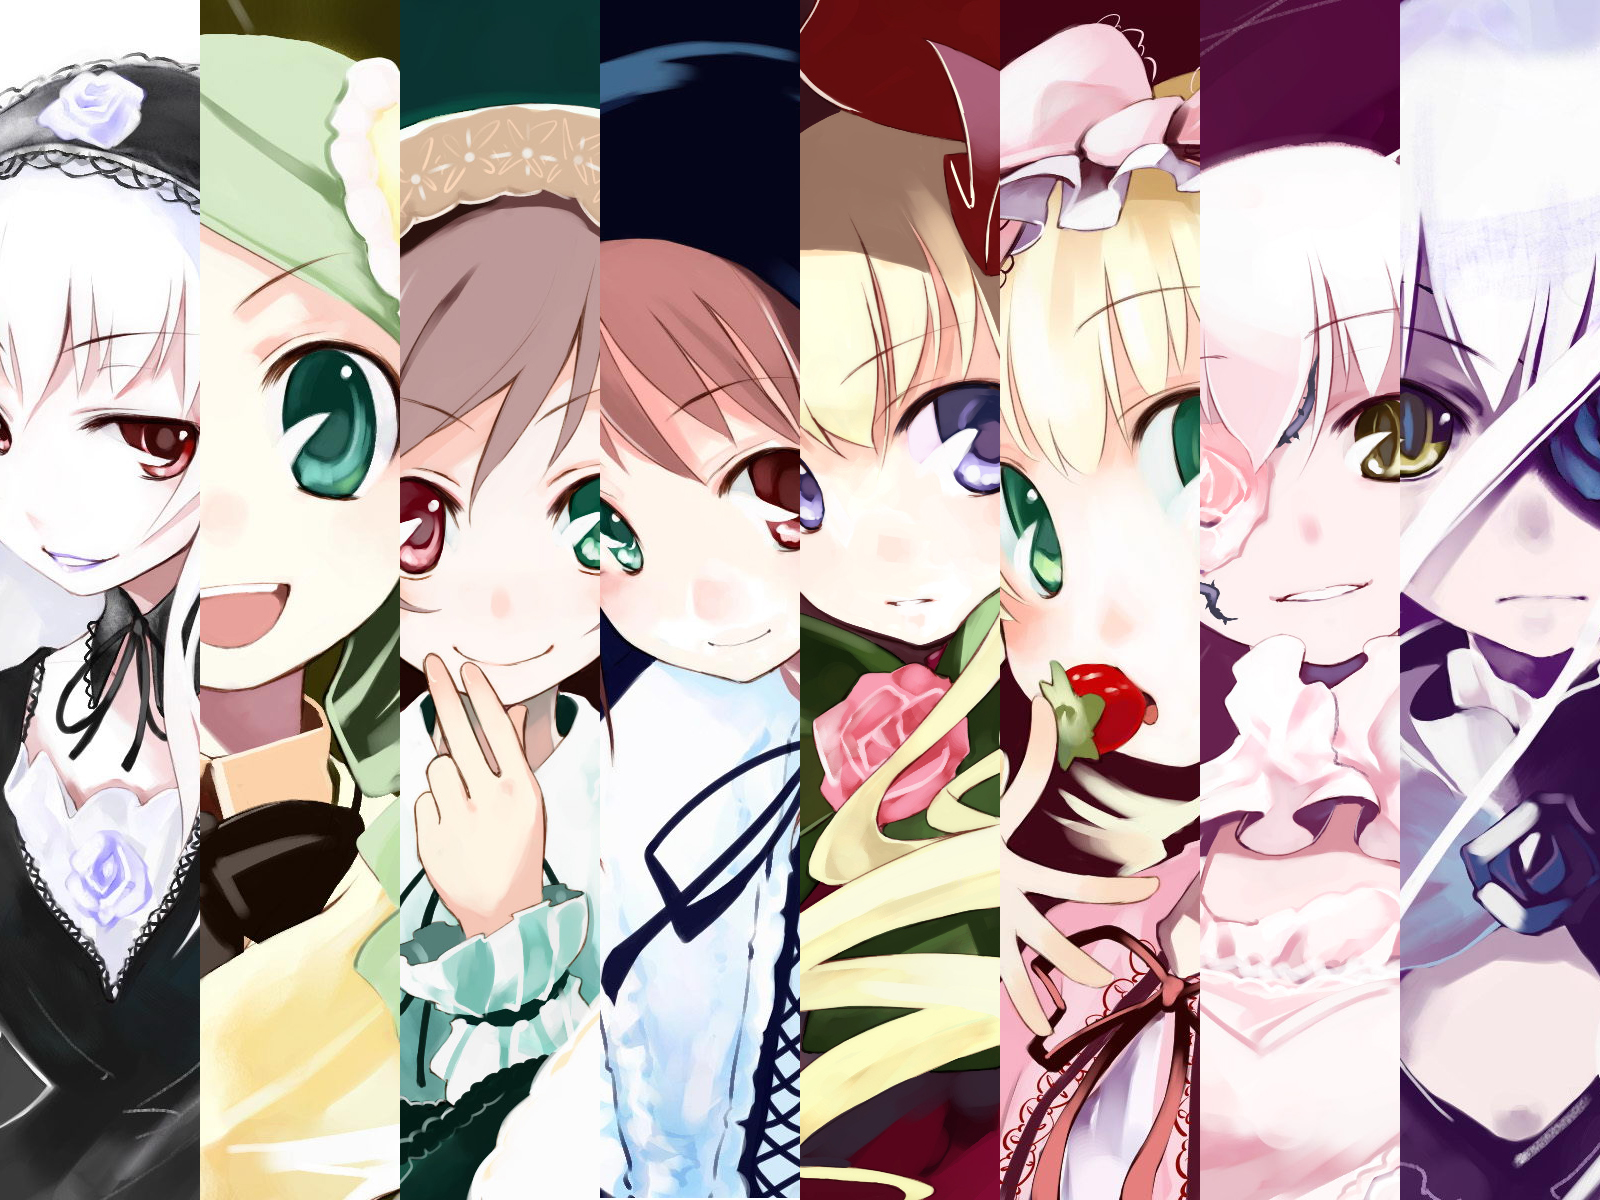 http://3.bp.blogspot.com/-sDvIS-t-J7w/Twgw603B0xI/AAAAAAAABLI/0j3Y1nrdL9o/s1600/Anime+Wallpaper+7.jpeg